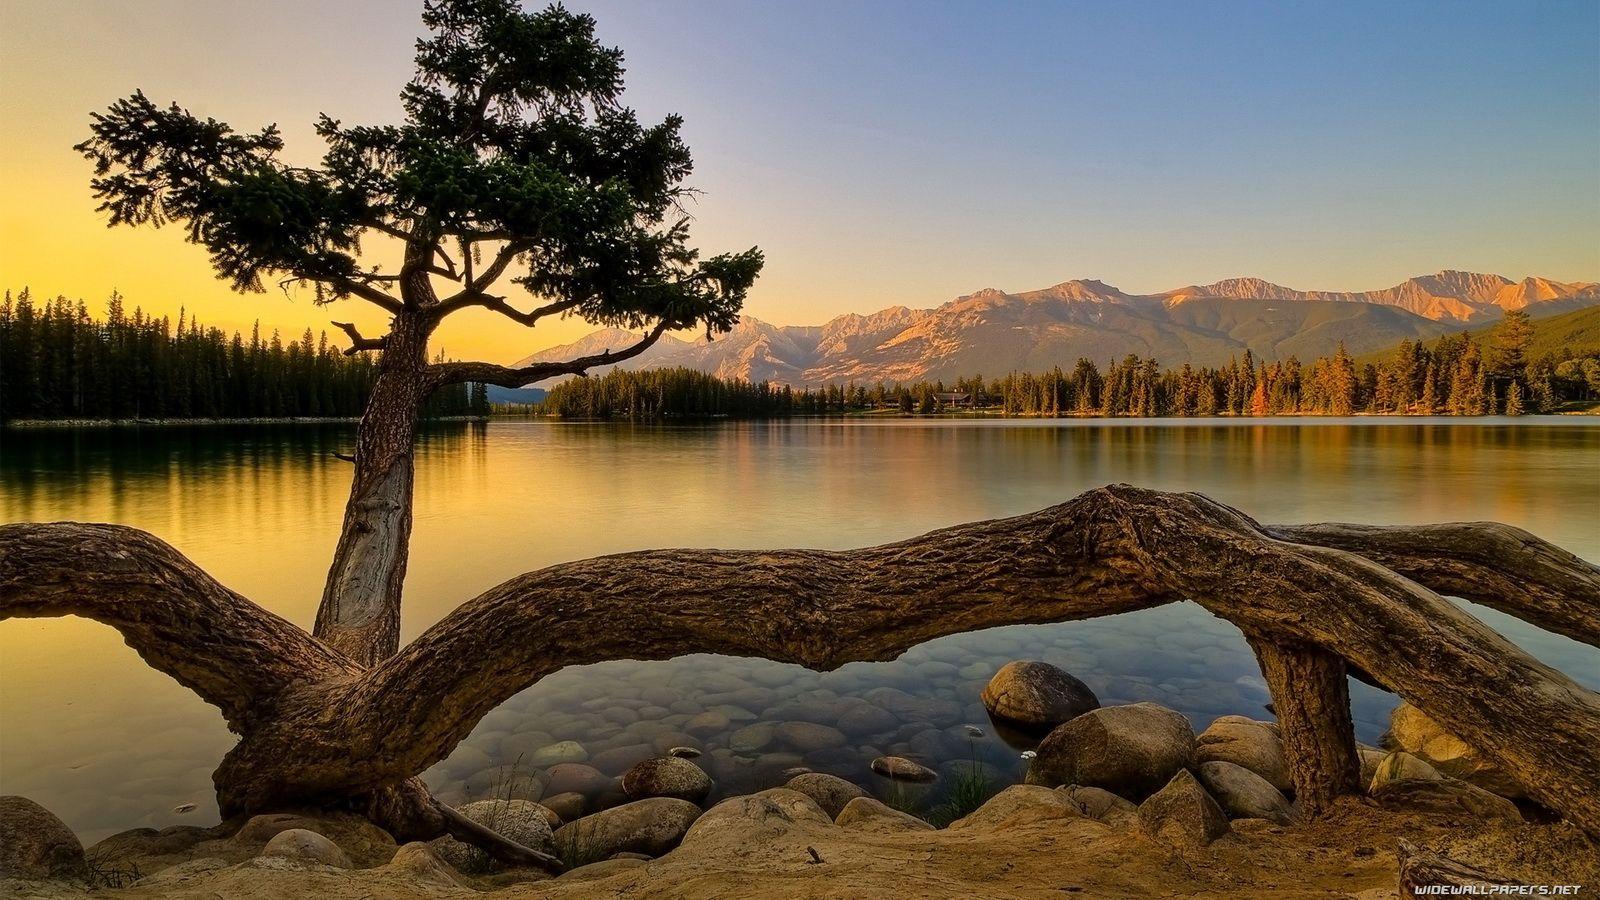 Free Nature Wallpaper Desktop Background Hd Nature Wallpapers Scenery Beautiful Nature